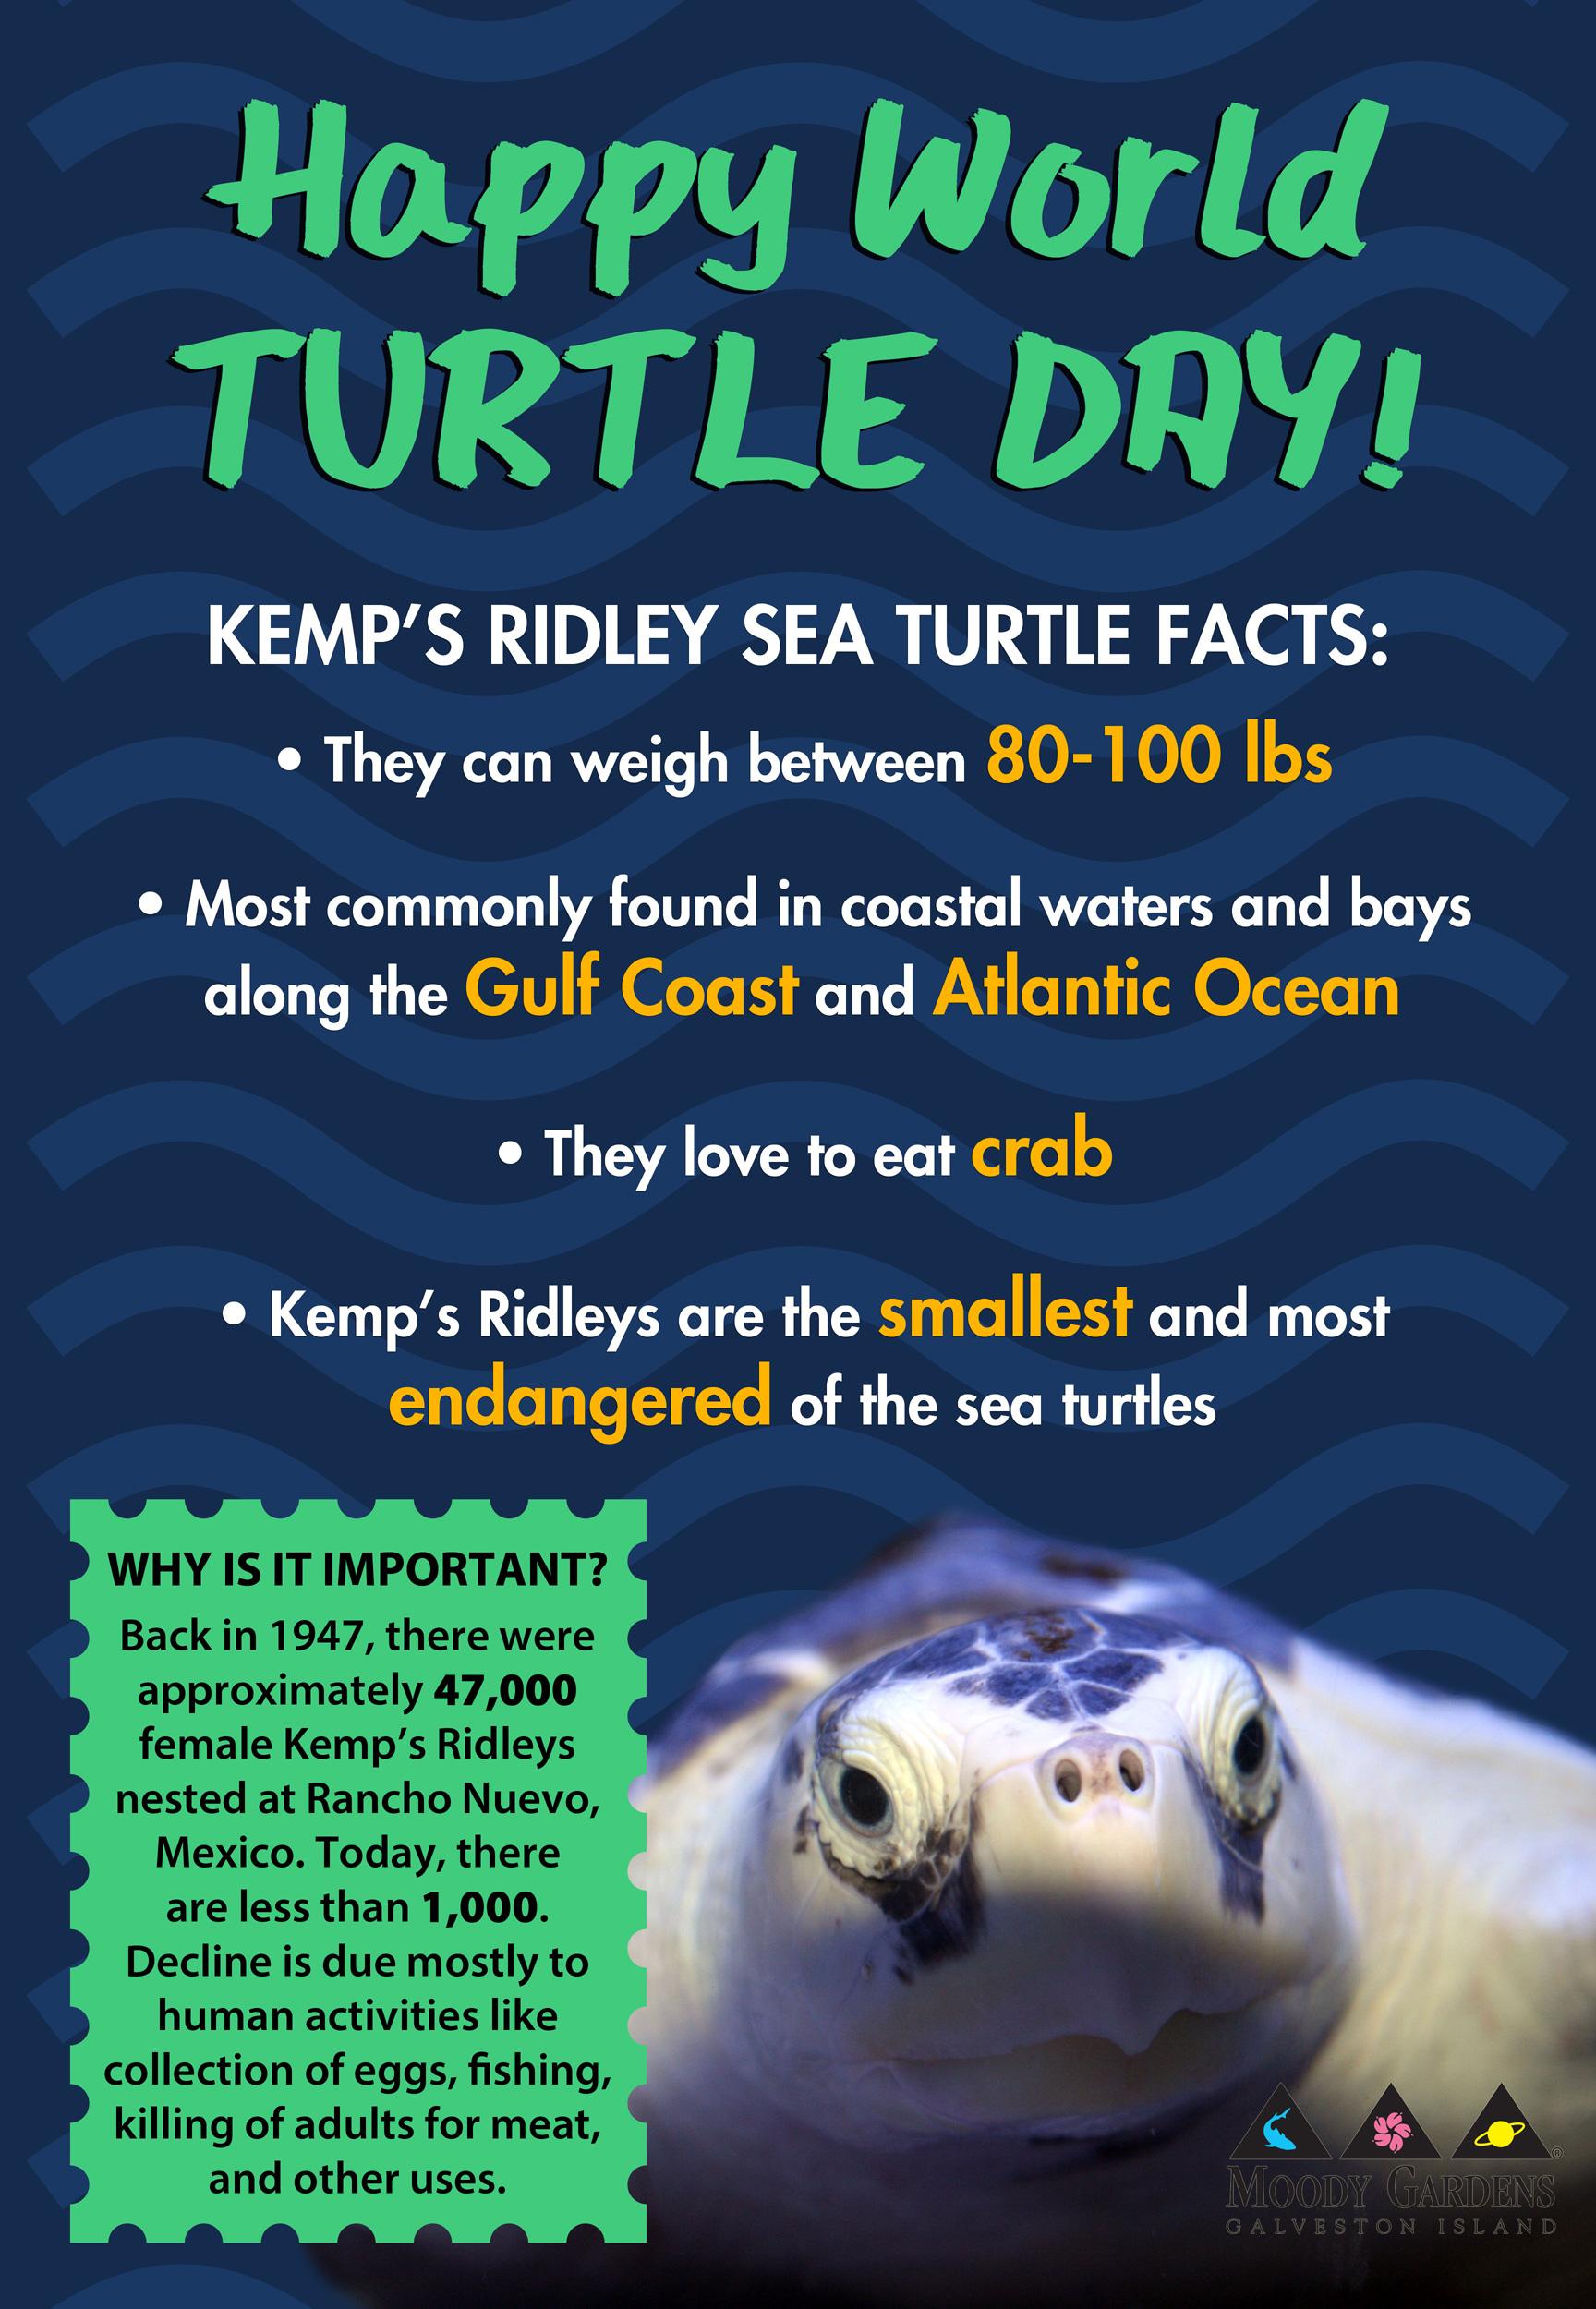 Happy World Turtle Day: Meet the Kemp's Ridley Sea Turtle